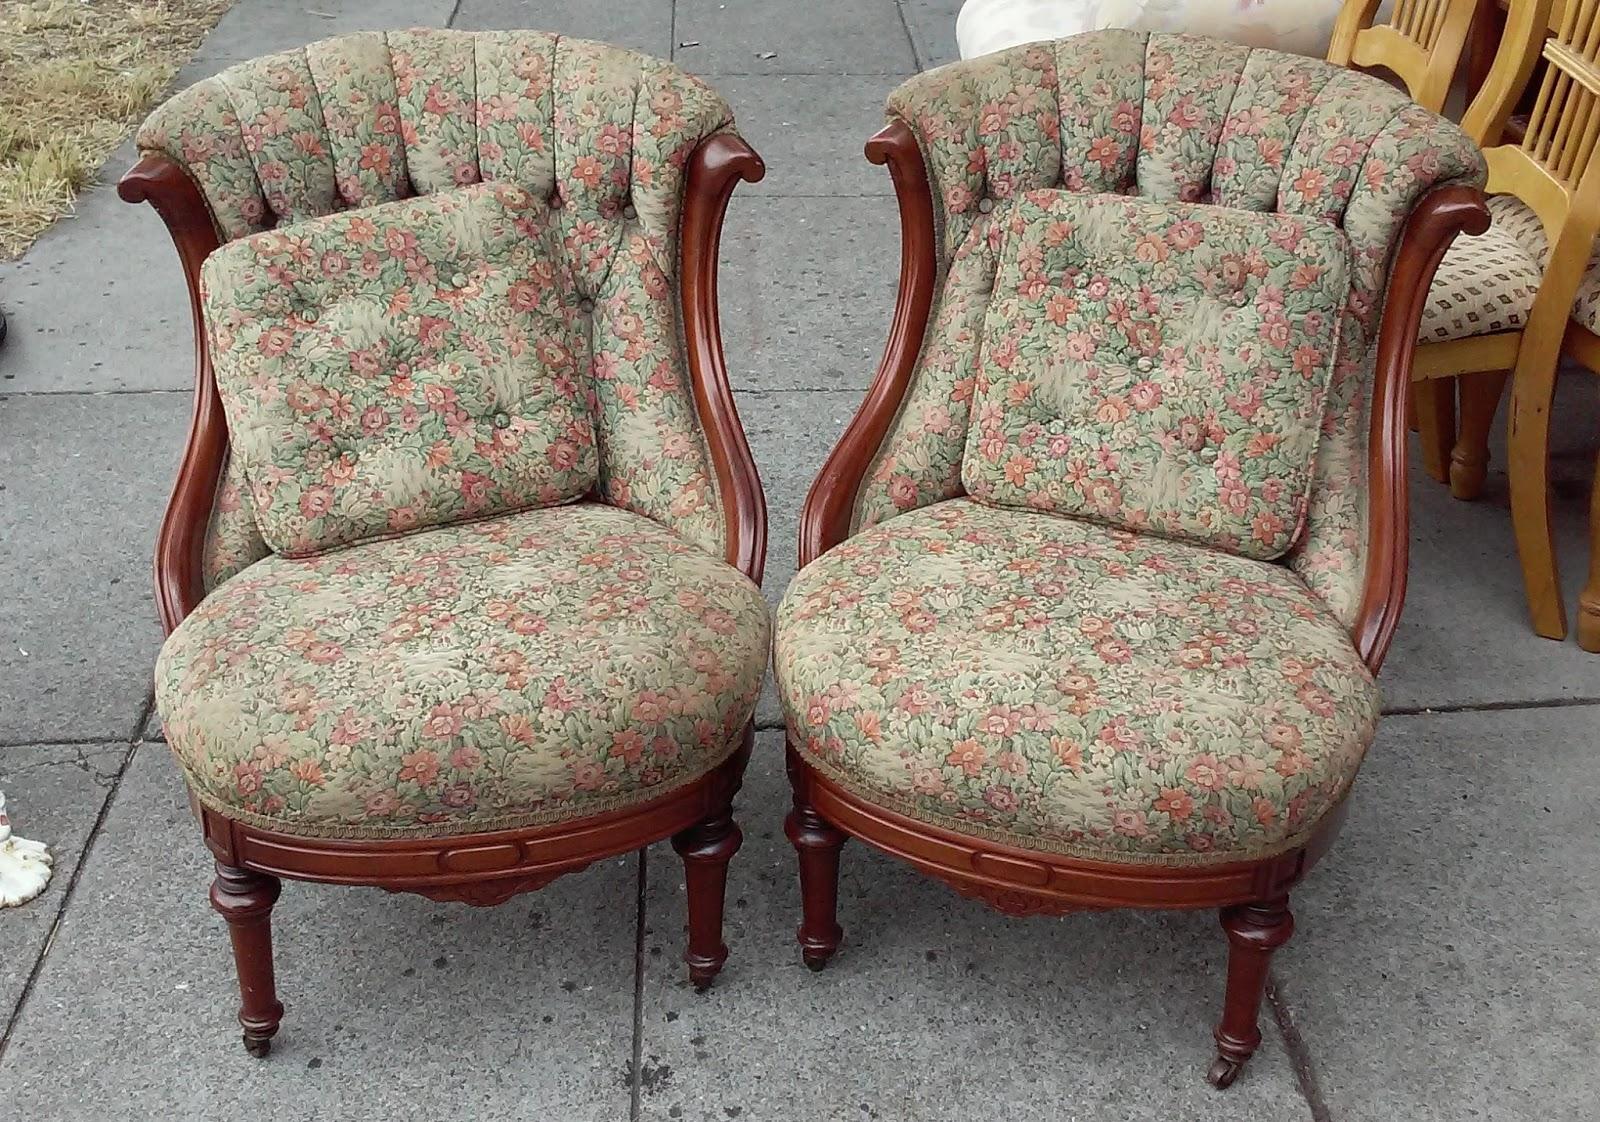 Fabulous Uhuru Furniture Collectibles Sold Bargain Buy 4341 Uwap Interior Chair Design Uwaporg